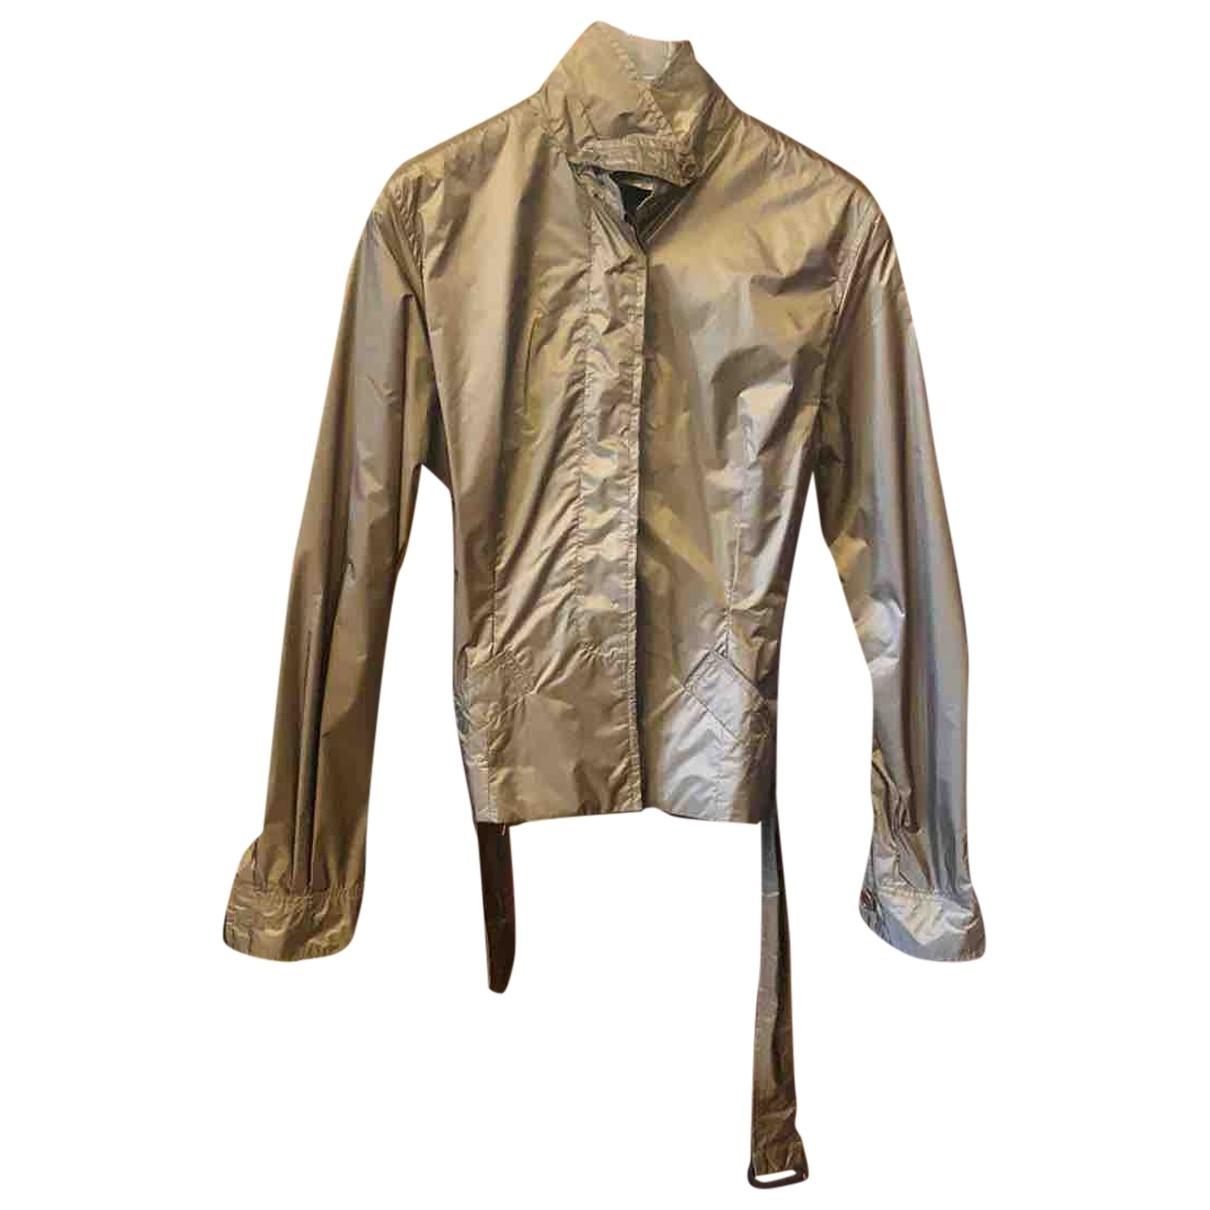 Aspesi \N Brown jacket for Women S International